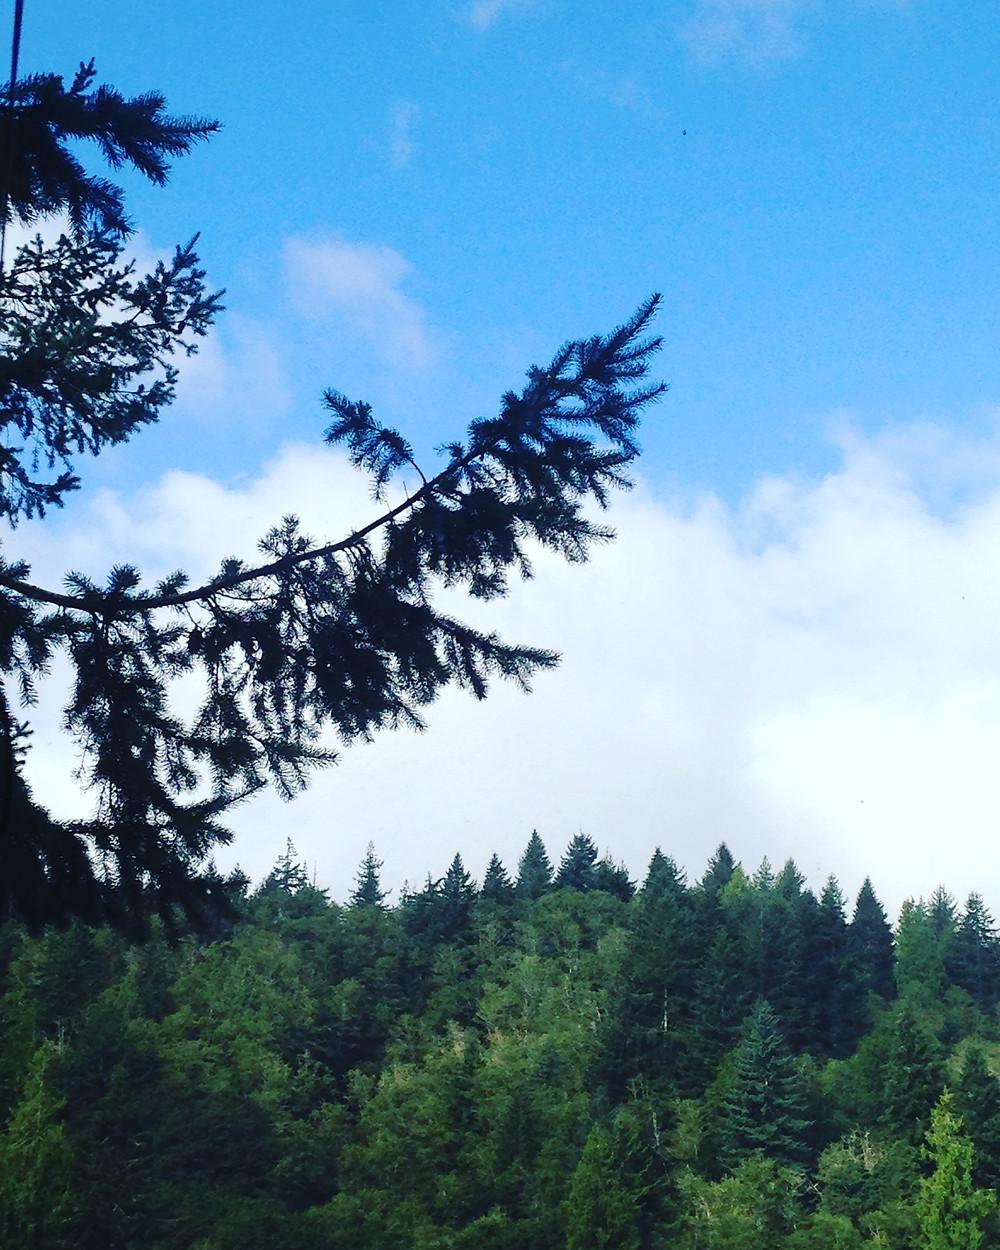 Forest at Tenmile Lake, Lakeside, Oregon - Oregon Coast. Photo courtesy of The Yellow Desk.